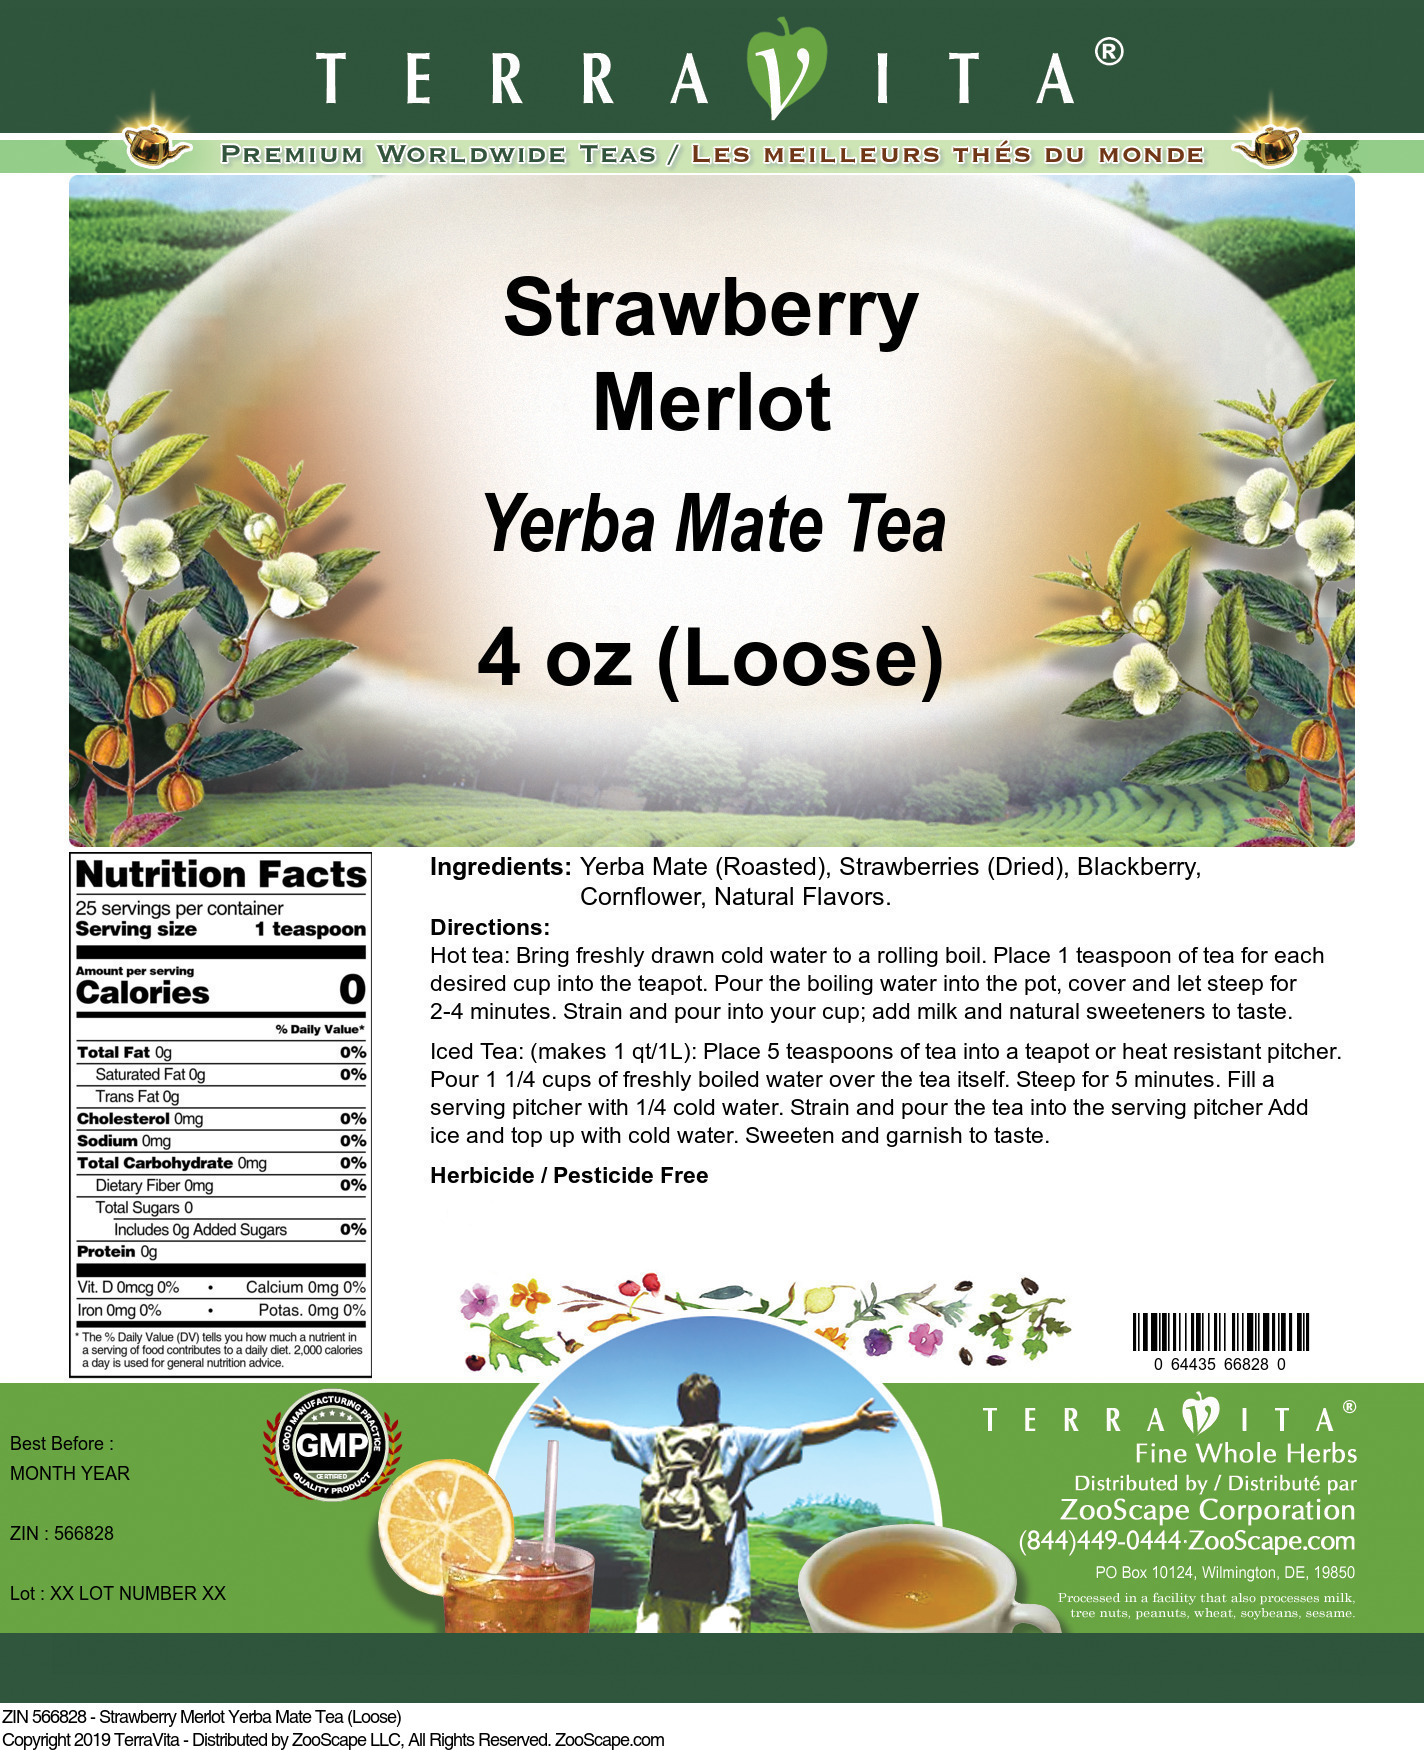 Strawberry Merlot Yerba Mate Tea (Loose)